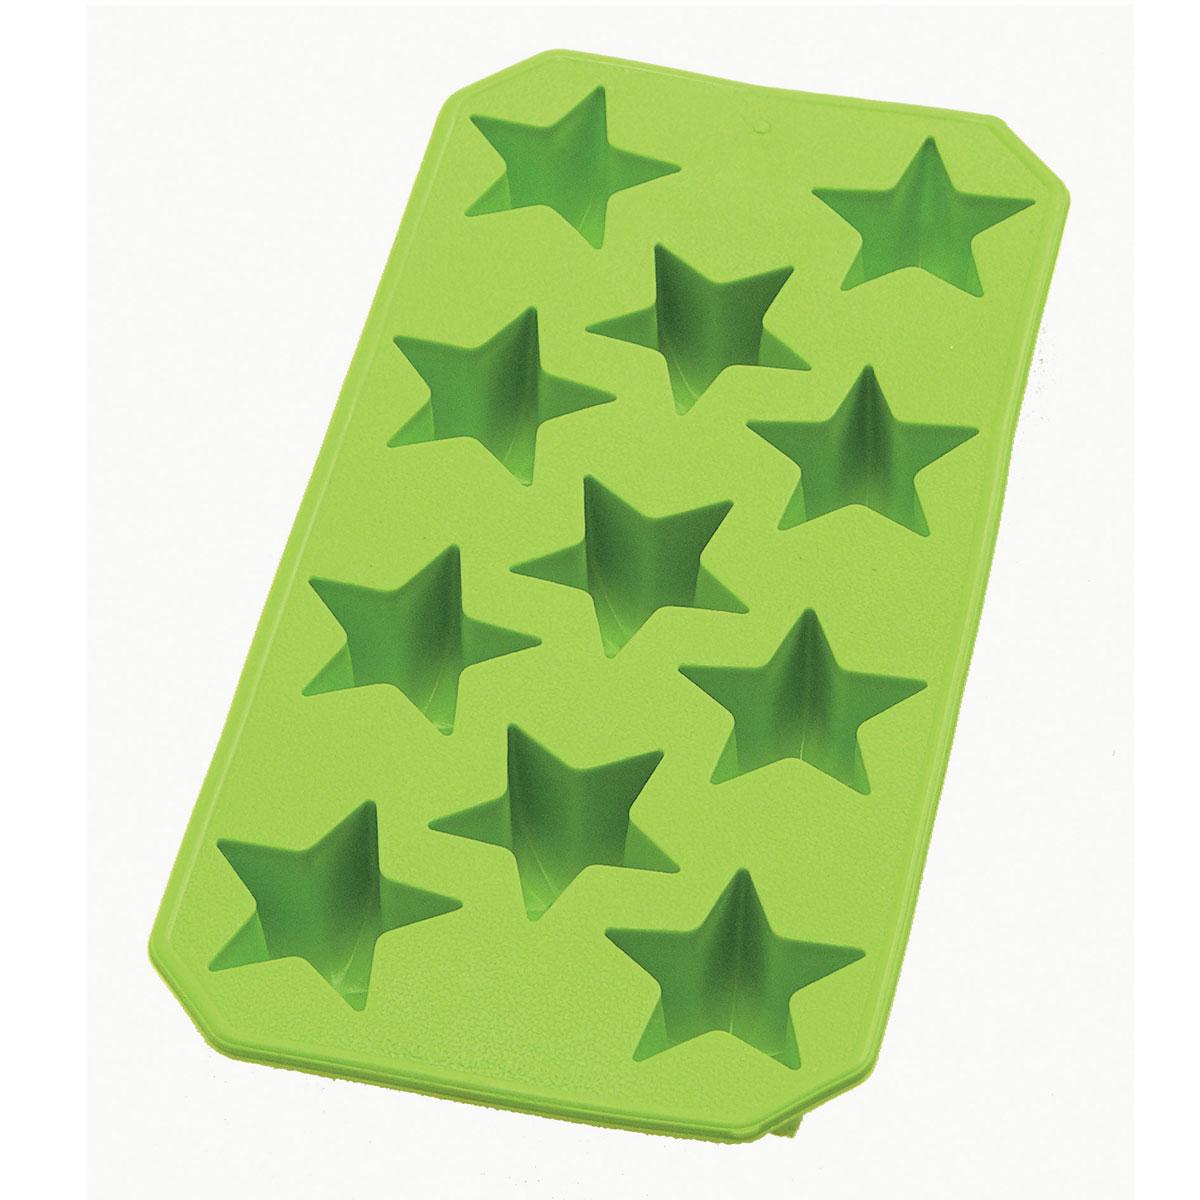 Форма для льда Lekue Звезды, цвет: зеленый, 11 ячеек